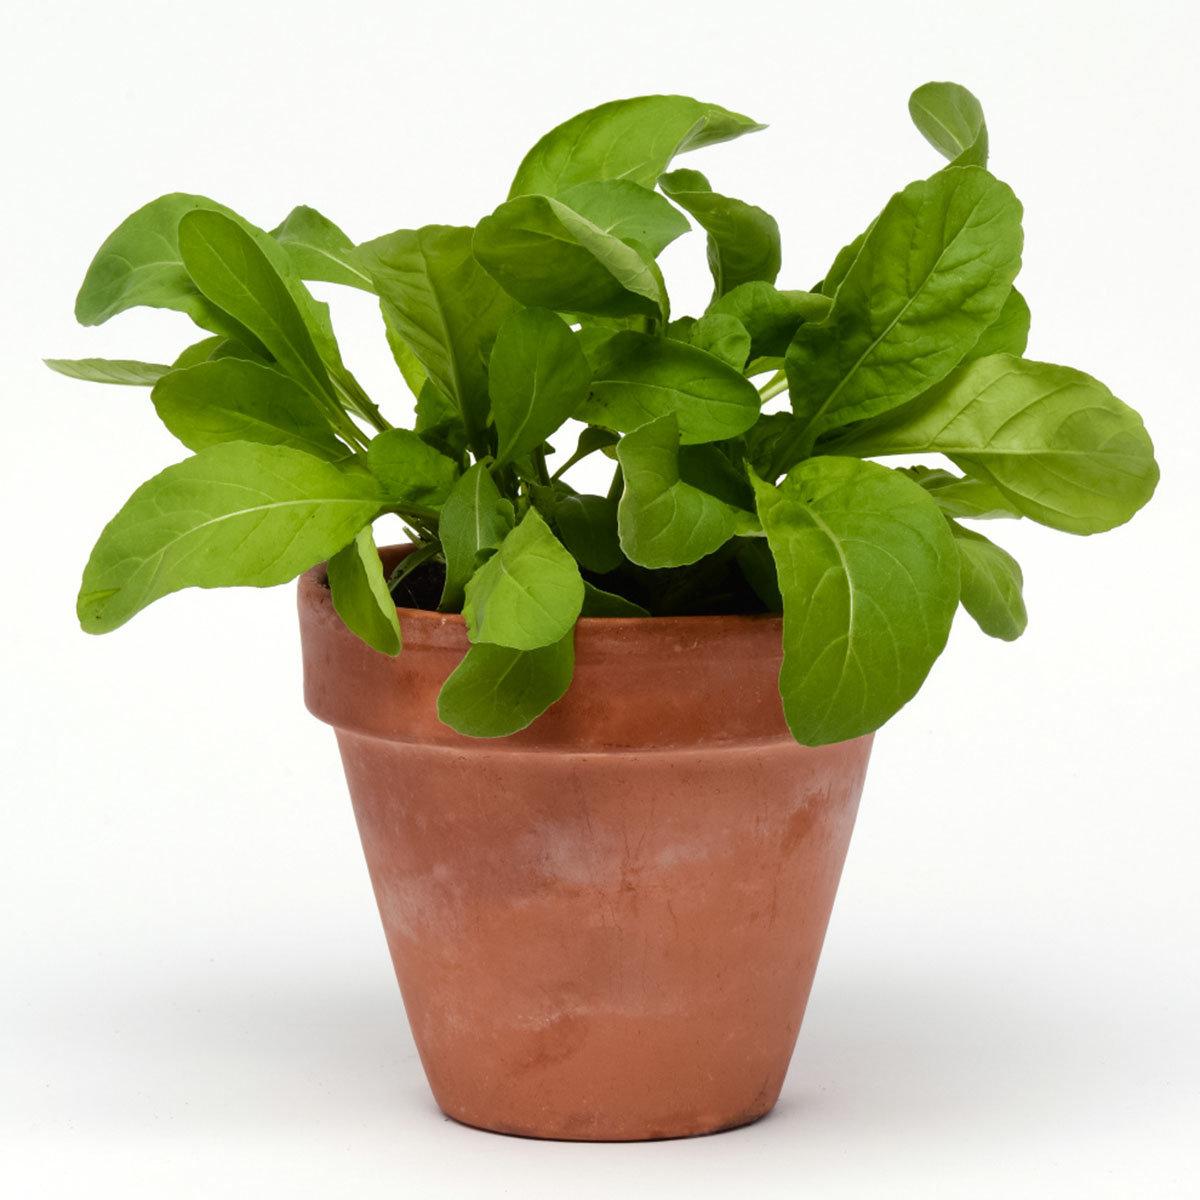 Rucolasamen Simply Salad Arugula, Multi-Pellets | #3